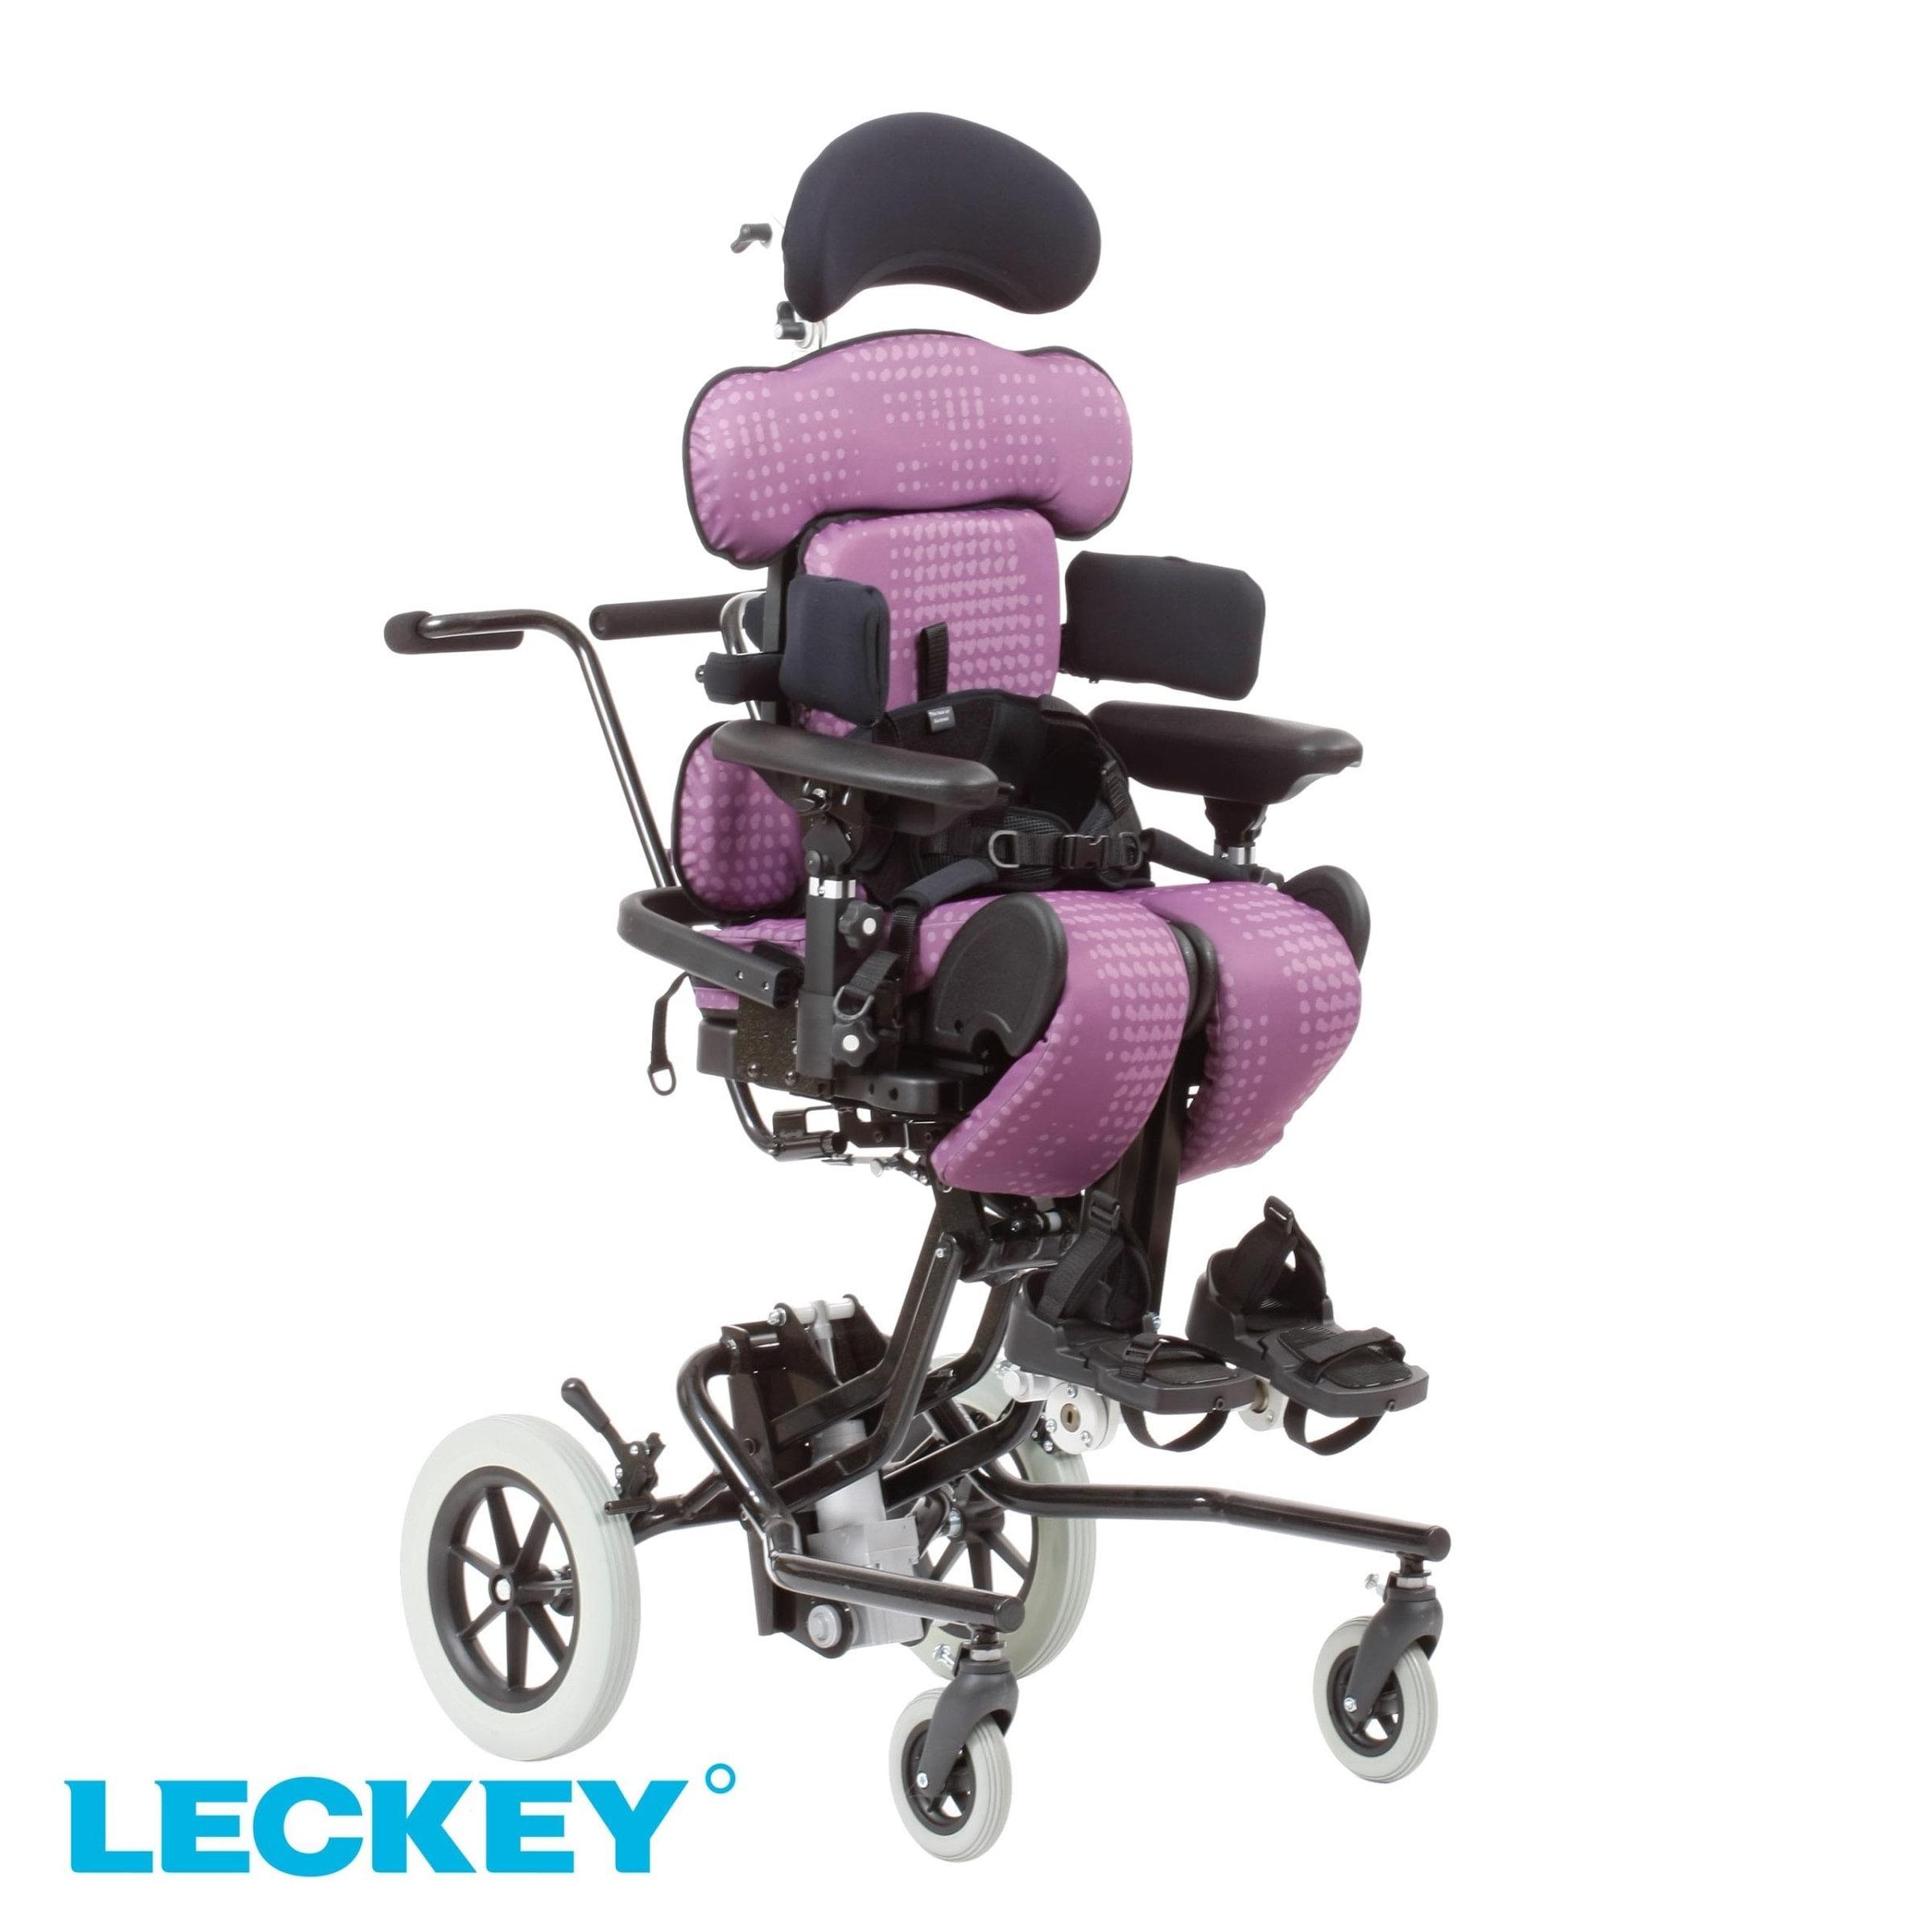 Tremendous Kit Seating System Ottobock De Ottobock Tr Complete Home Design Collection Papxelindsey Bellcom